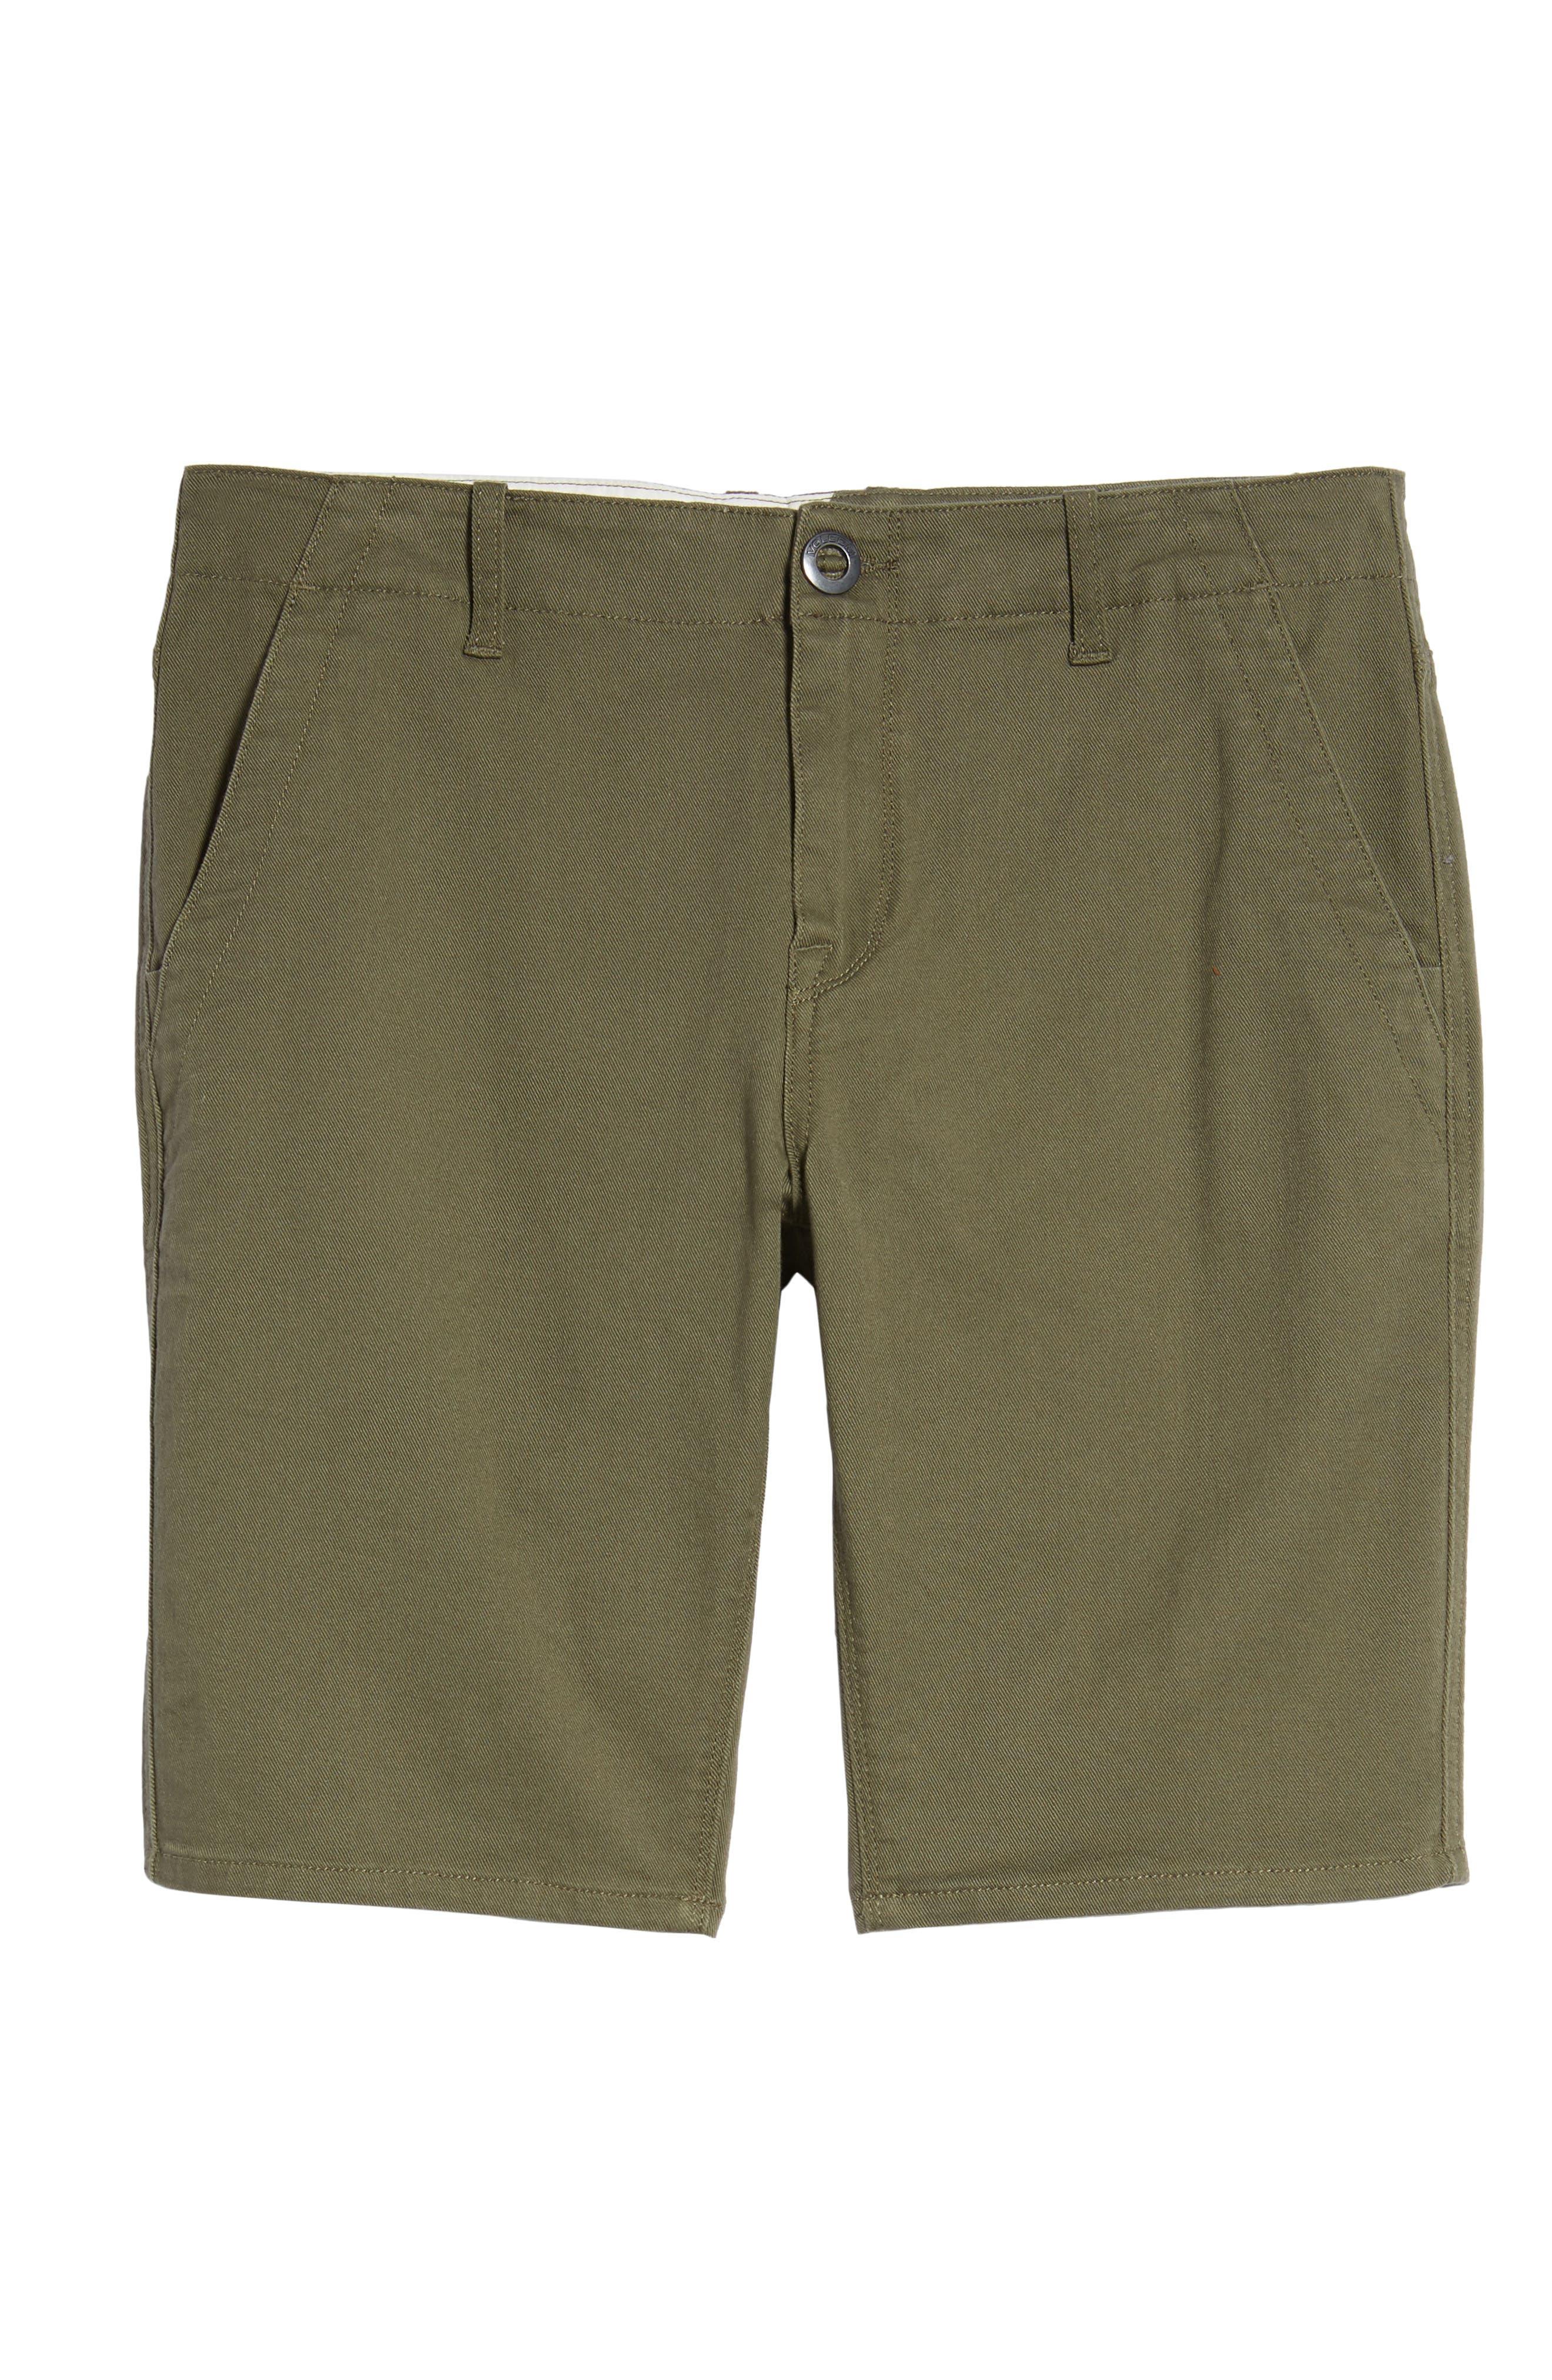 VSM Prowler Shorts,                             Alternate thumbnail 6, color,                             Military